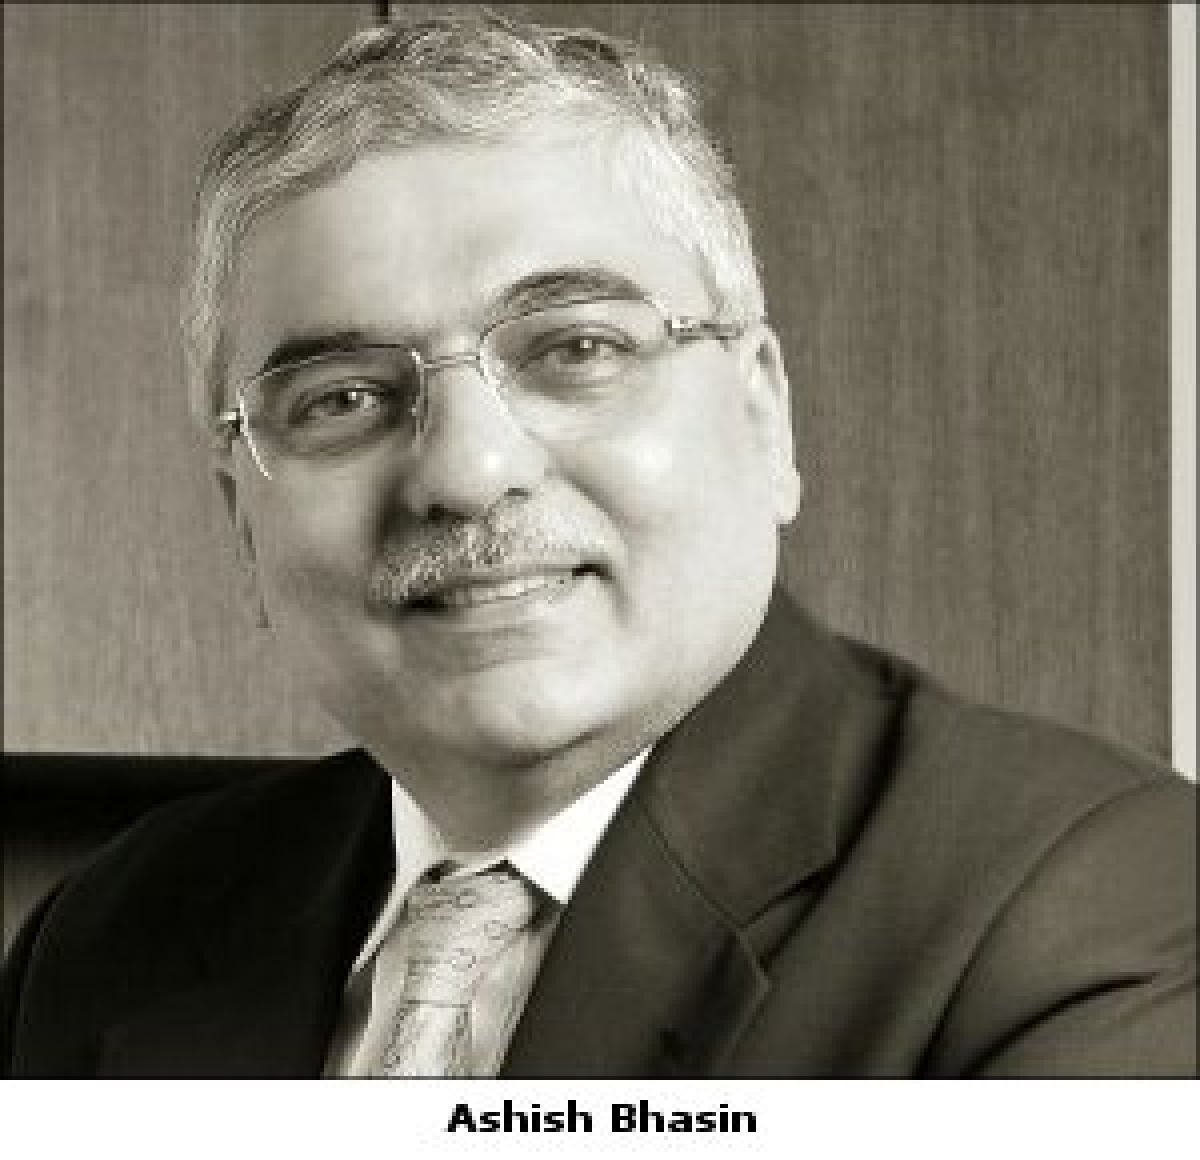 Goafest 2017: Dentsu Aegis Network's Ashish Bhasin named chairman